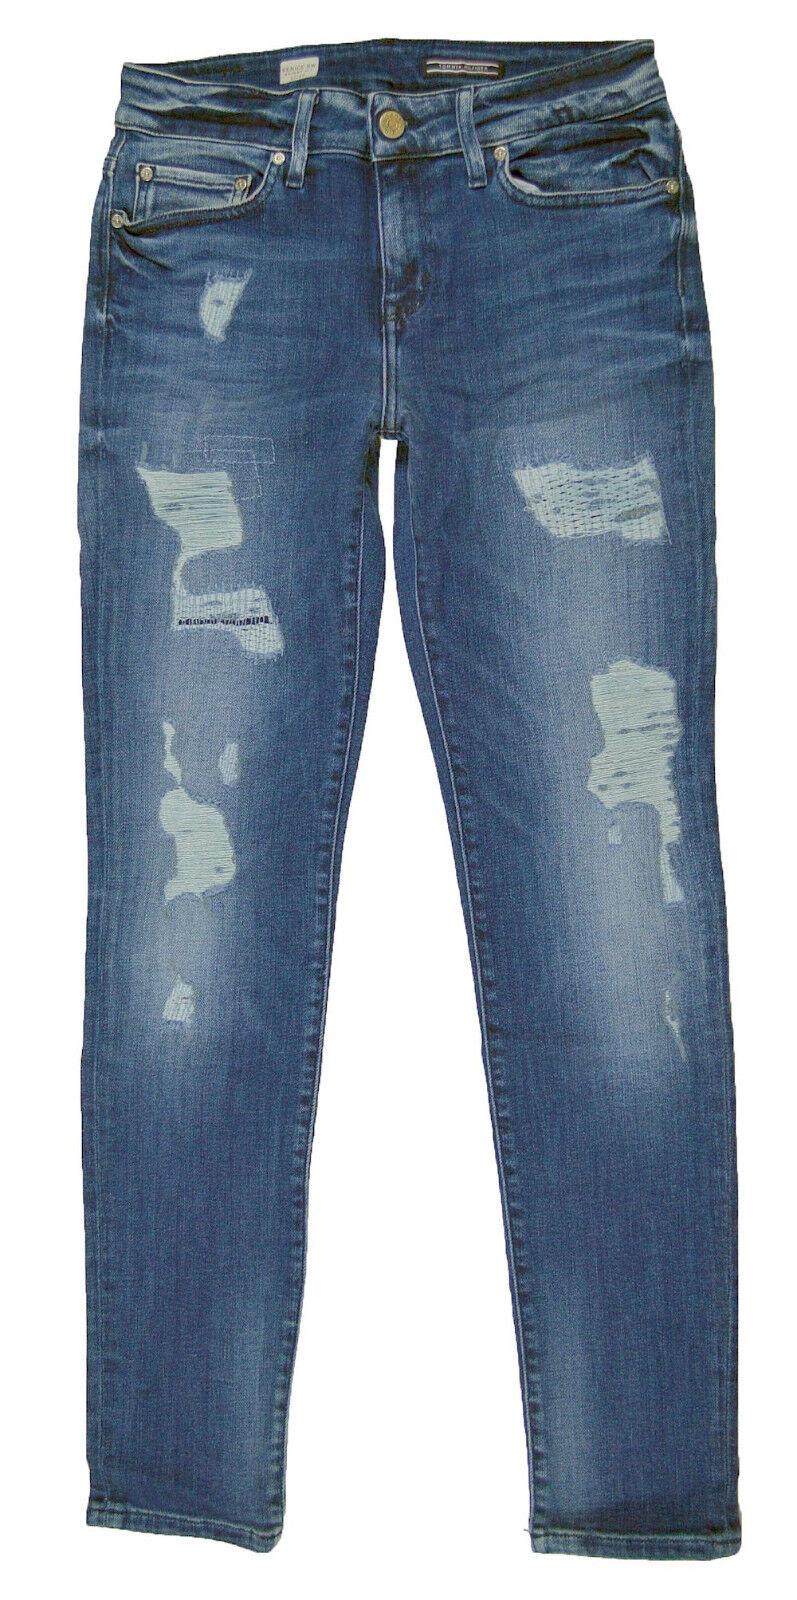 Tommy Hilfiger Venice Skinny Fit Regular Waist Damen Jeans Hosen 1-1259